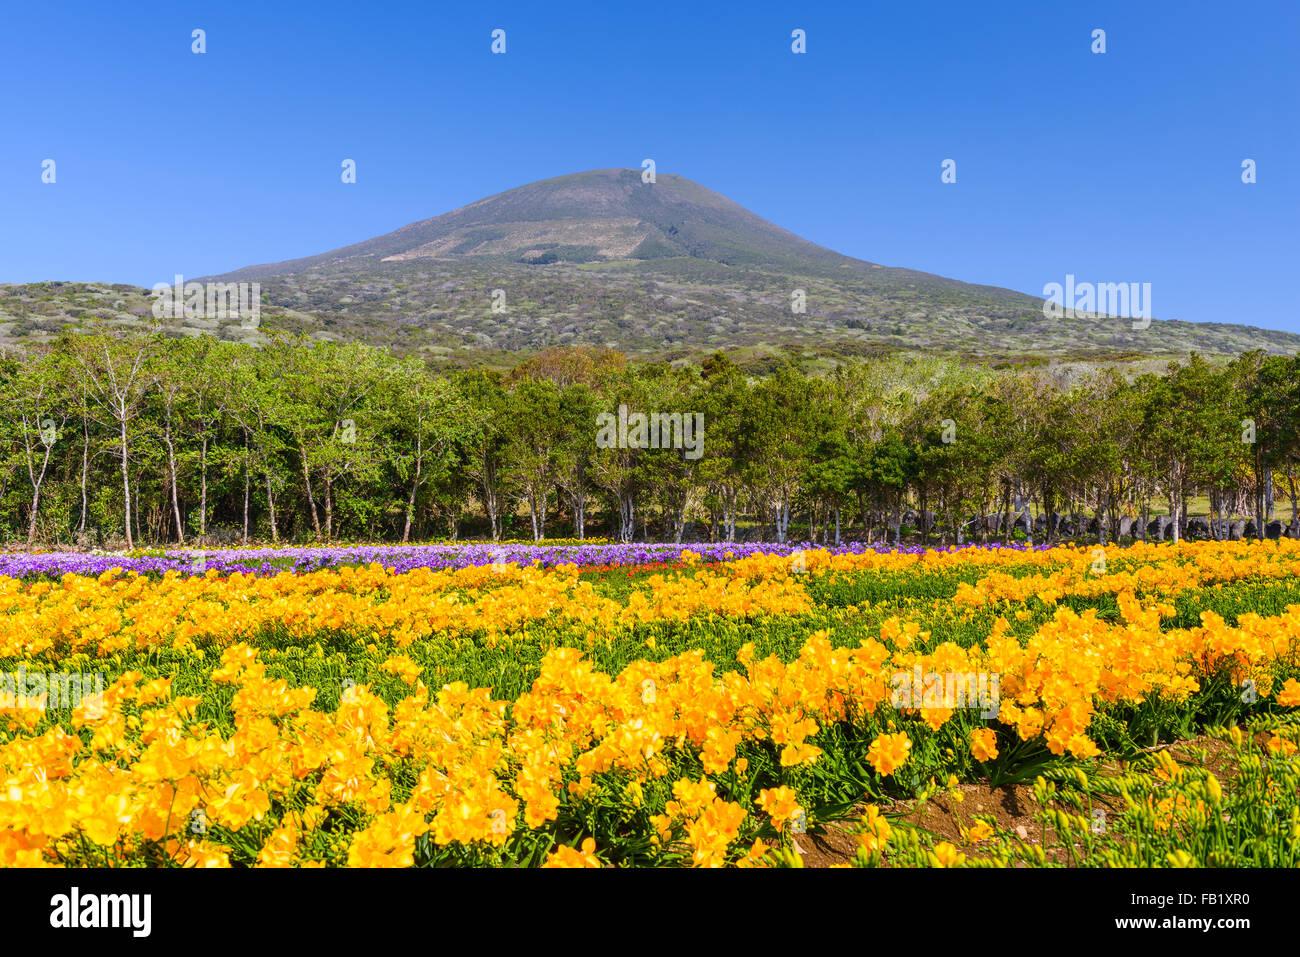 Hachijojima Island, Japan during the Freesia flower bloom season. - Stock Image